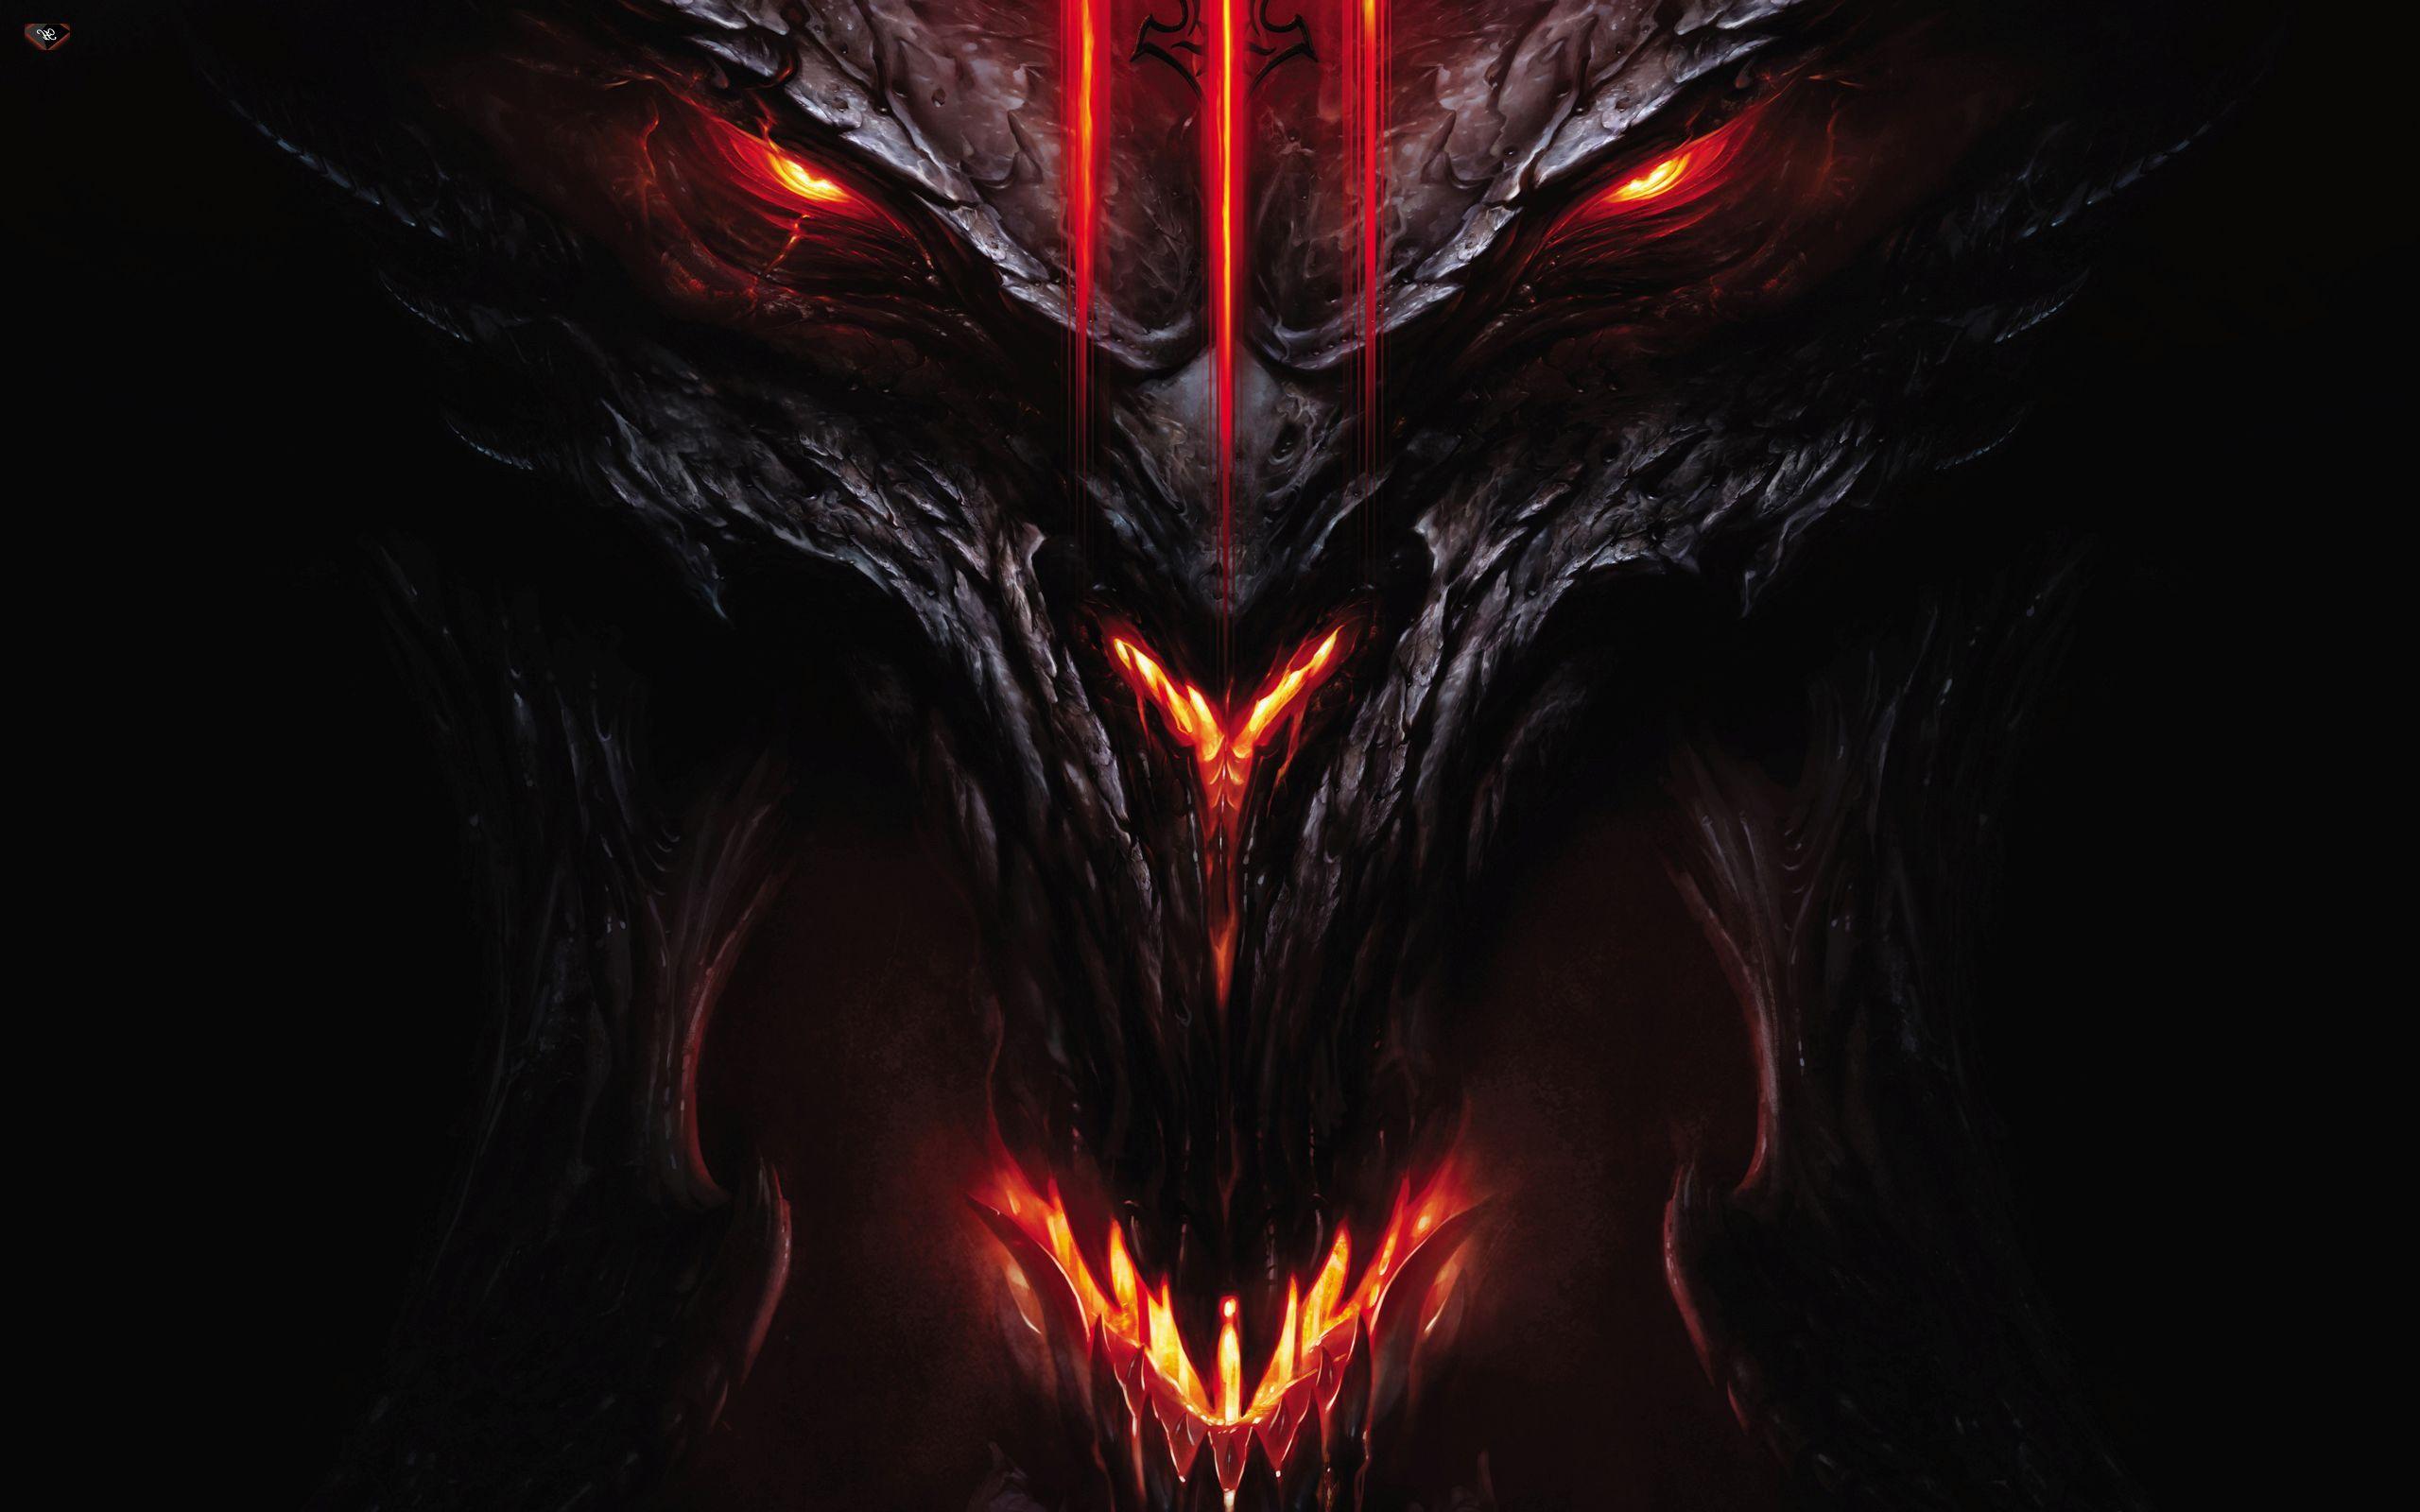 Diablo 3 HD wallpapers download 2560x1600